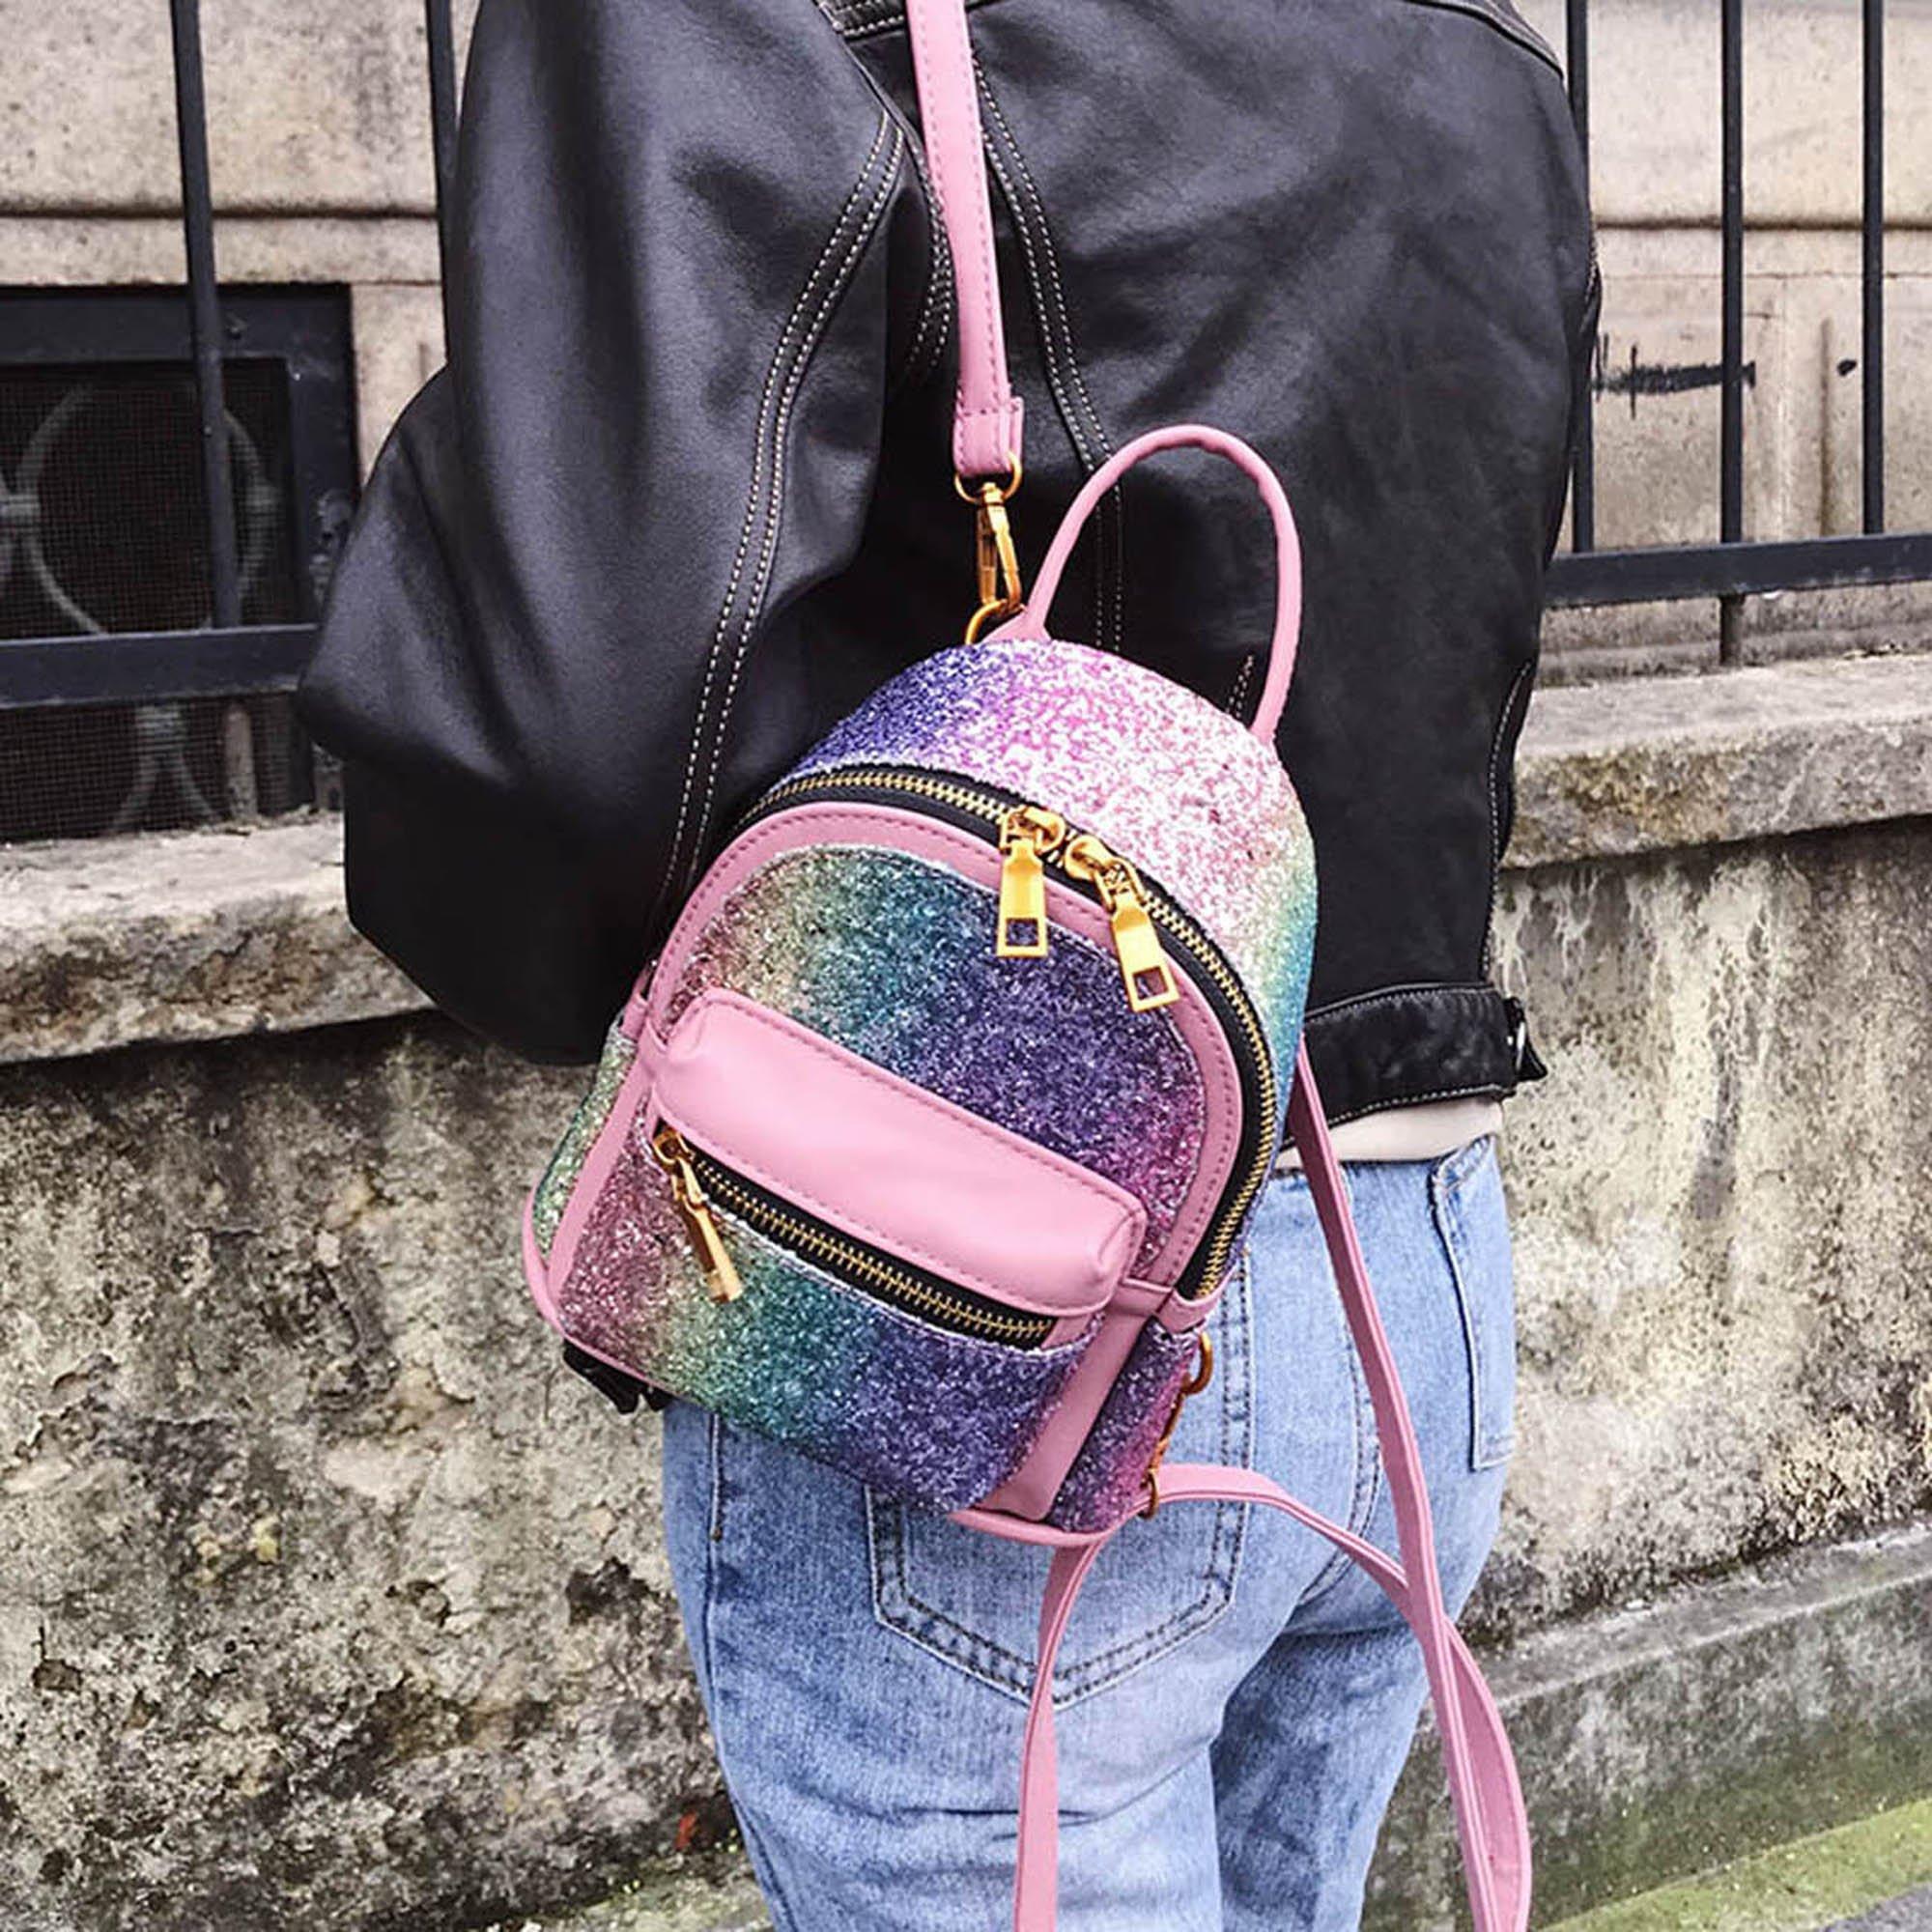 Girls Bling Mini Travel Backpack Kids Children School Bags Satchel Purses Daypack (pink rainbow) by JIANBAO (Image #4)